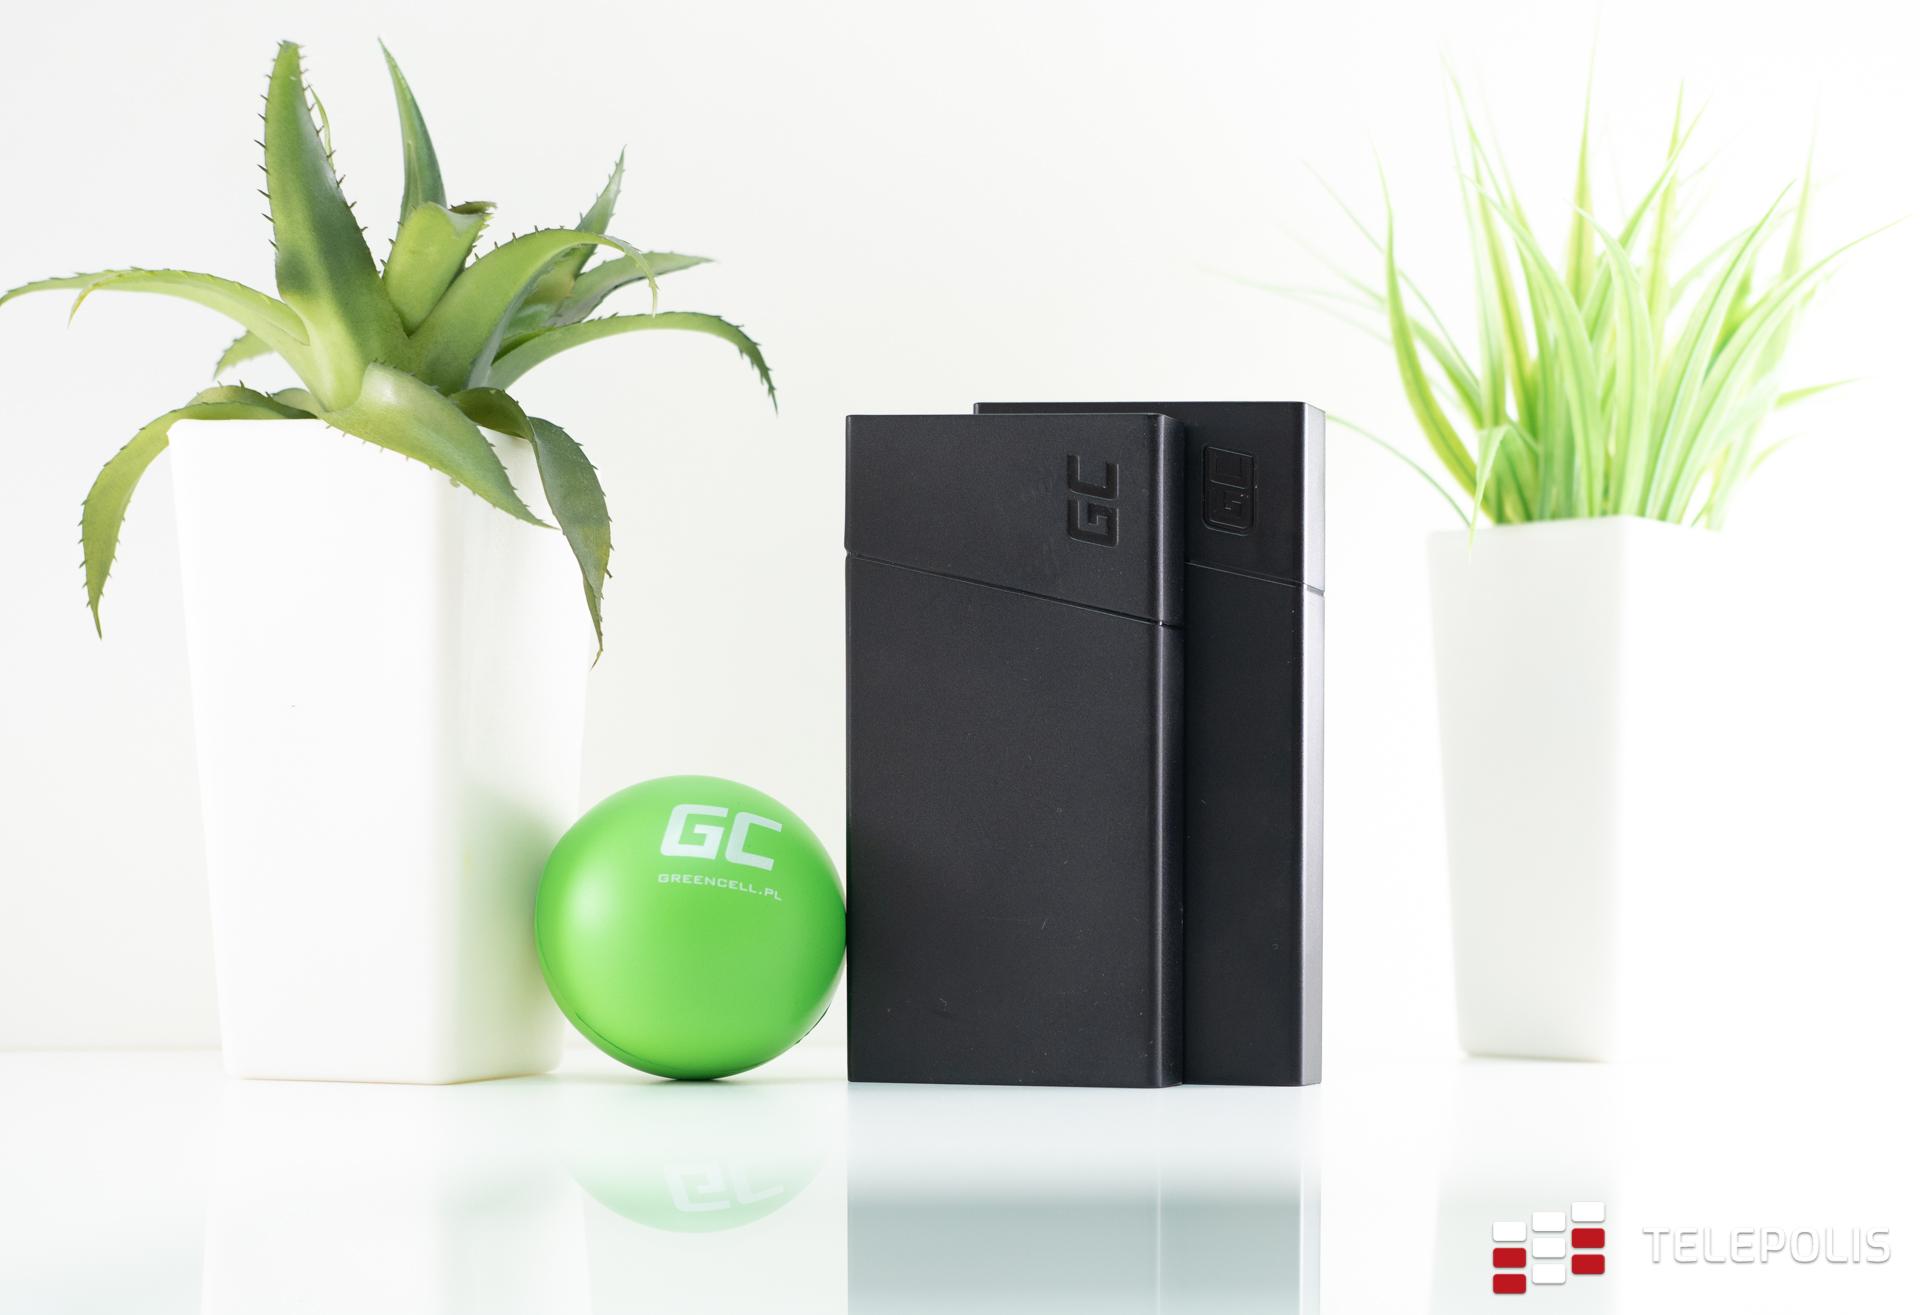 Green Cell PowerPlay 10000mAh